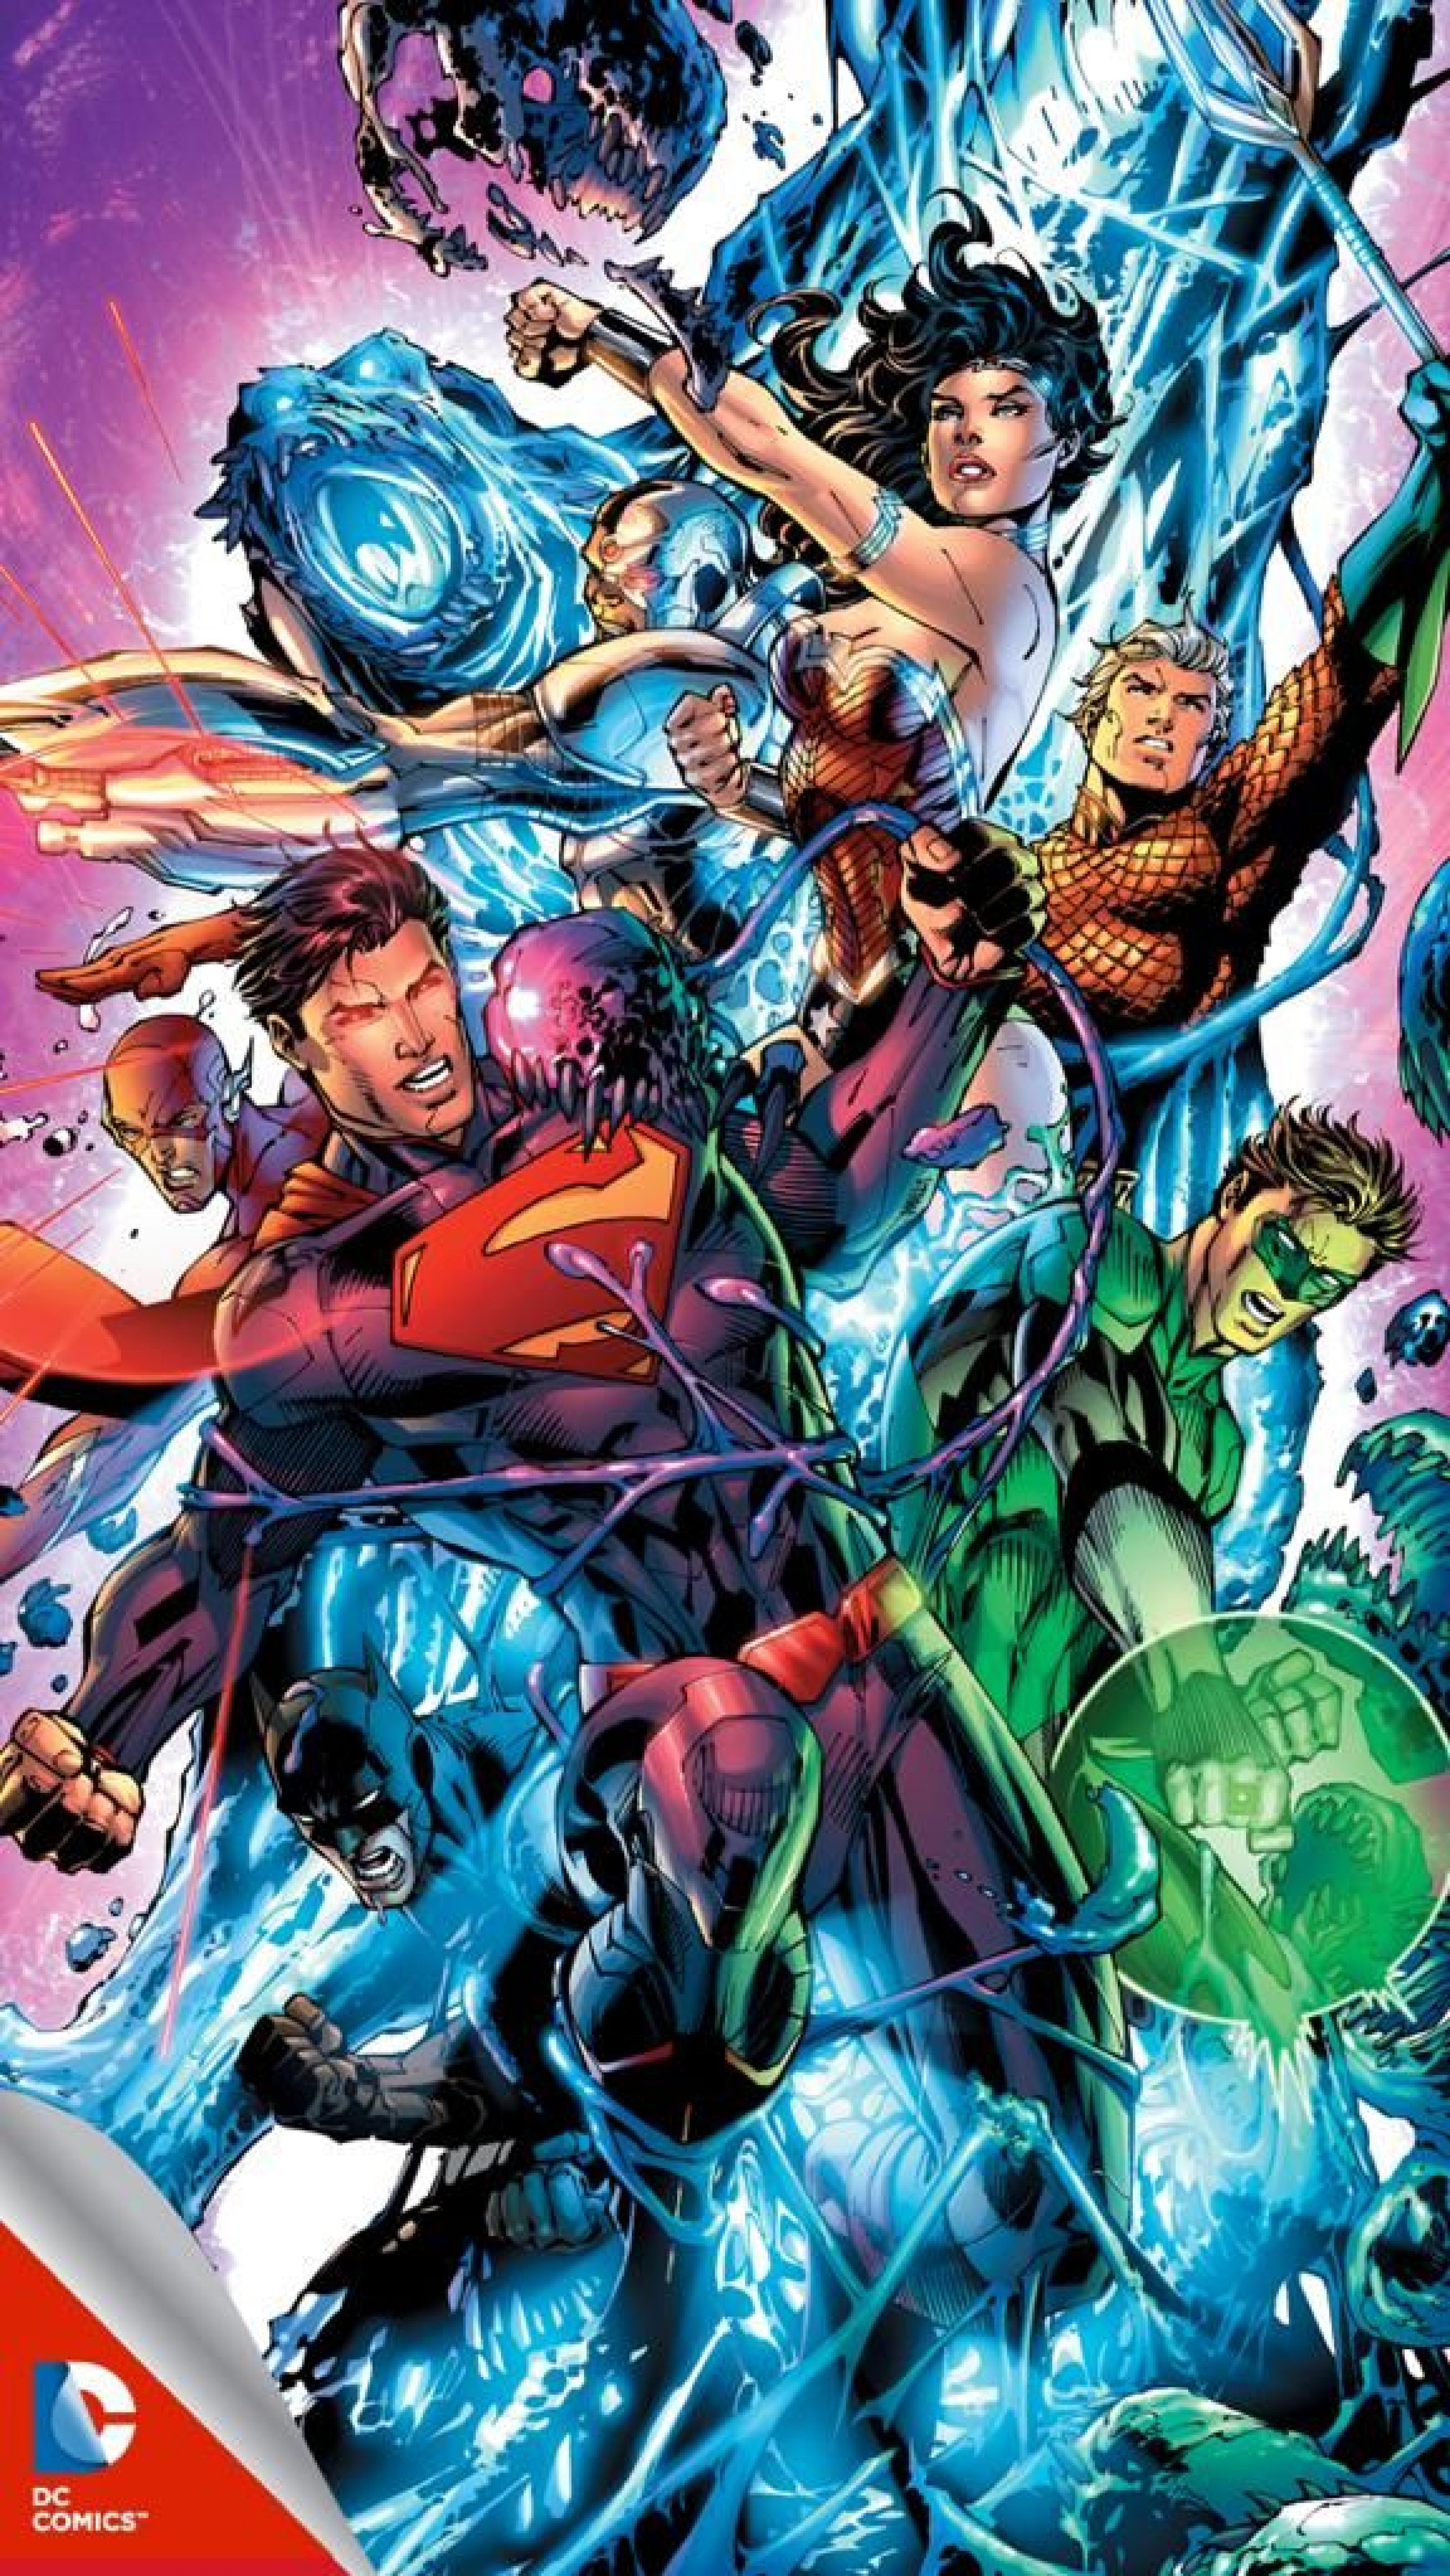 Dc superheroes wallpapers wallpaper cave - Dc characters wallpaper hd ...